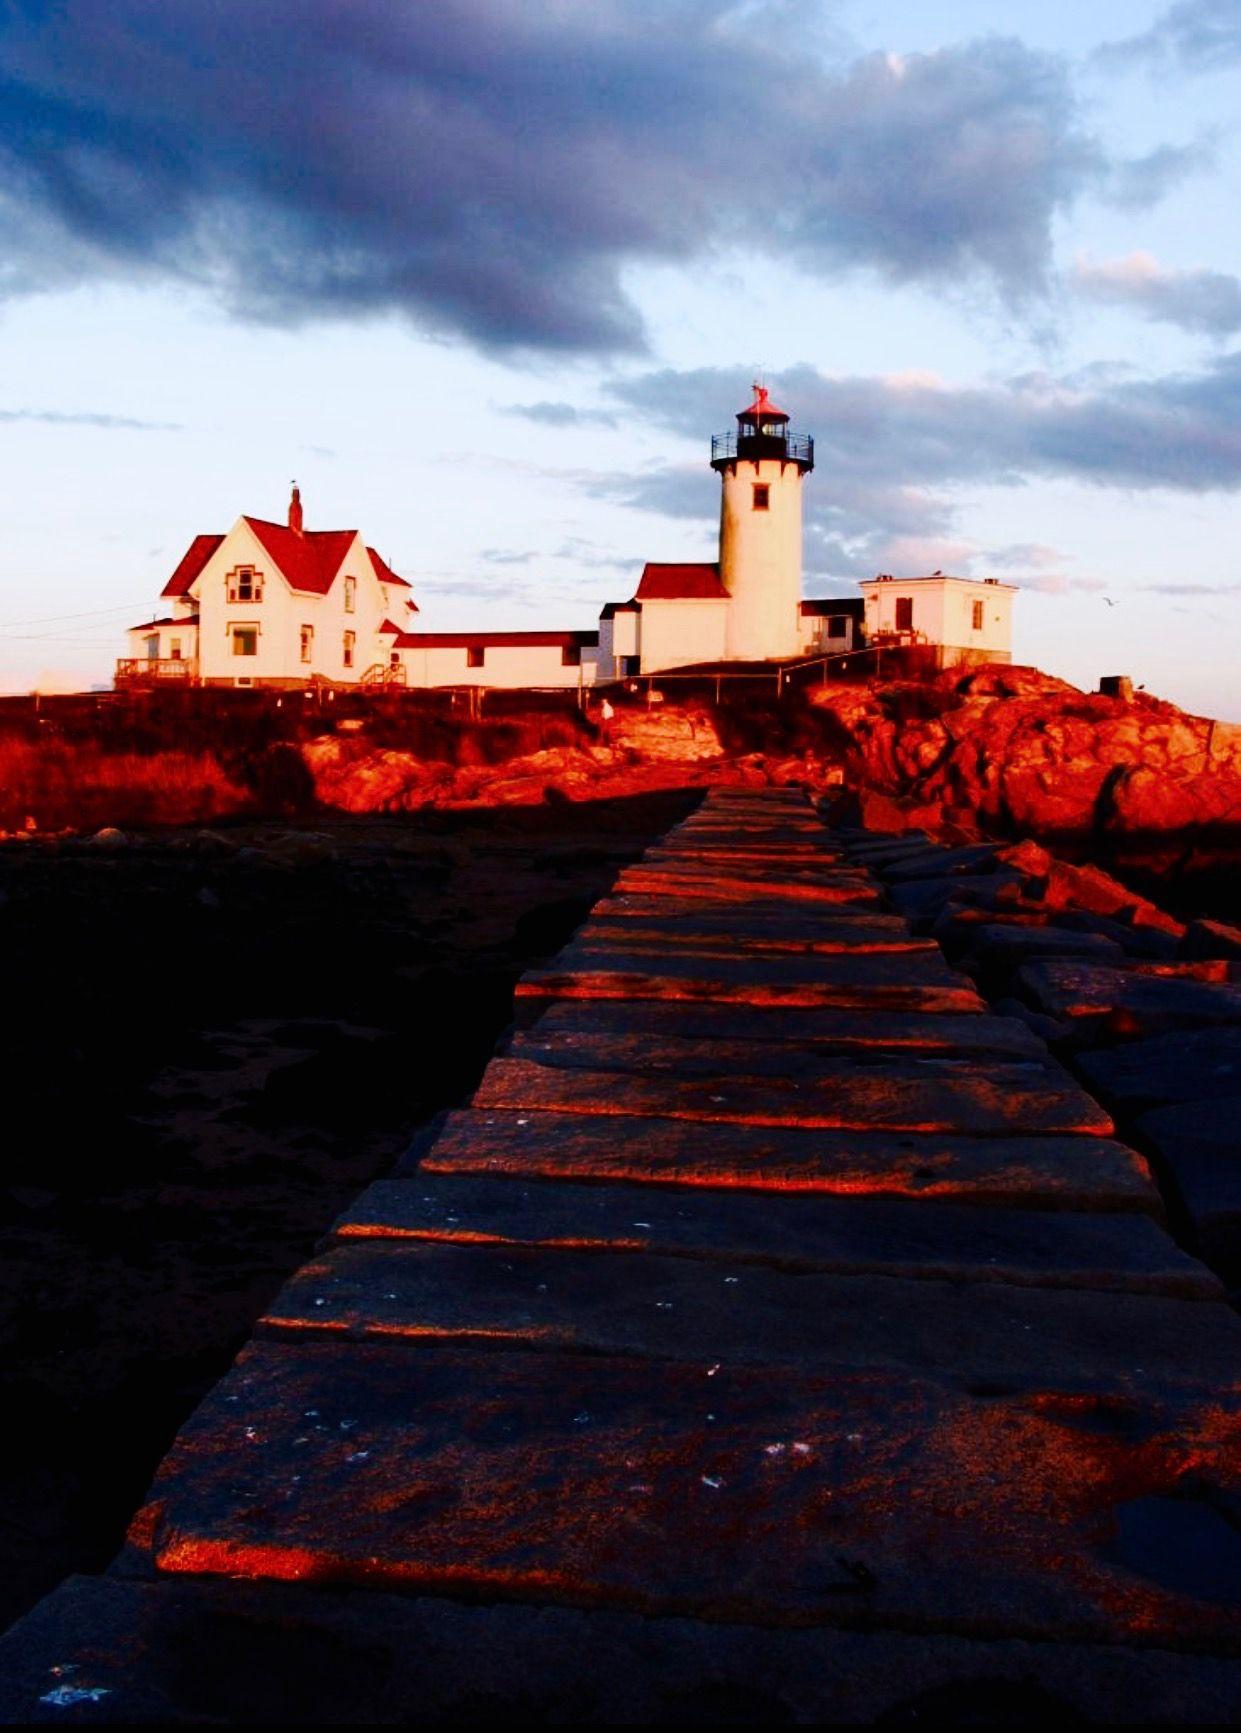 North of Boston, Massachusetts